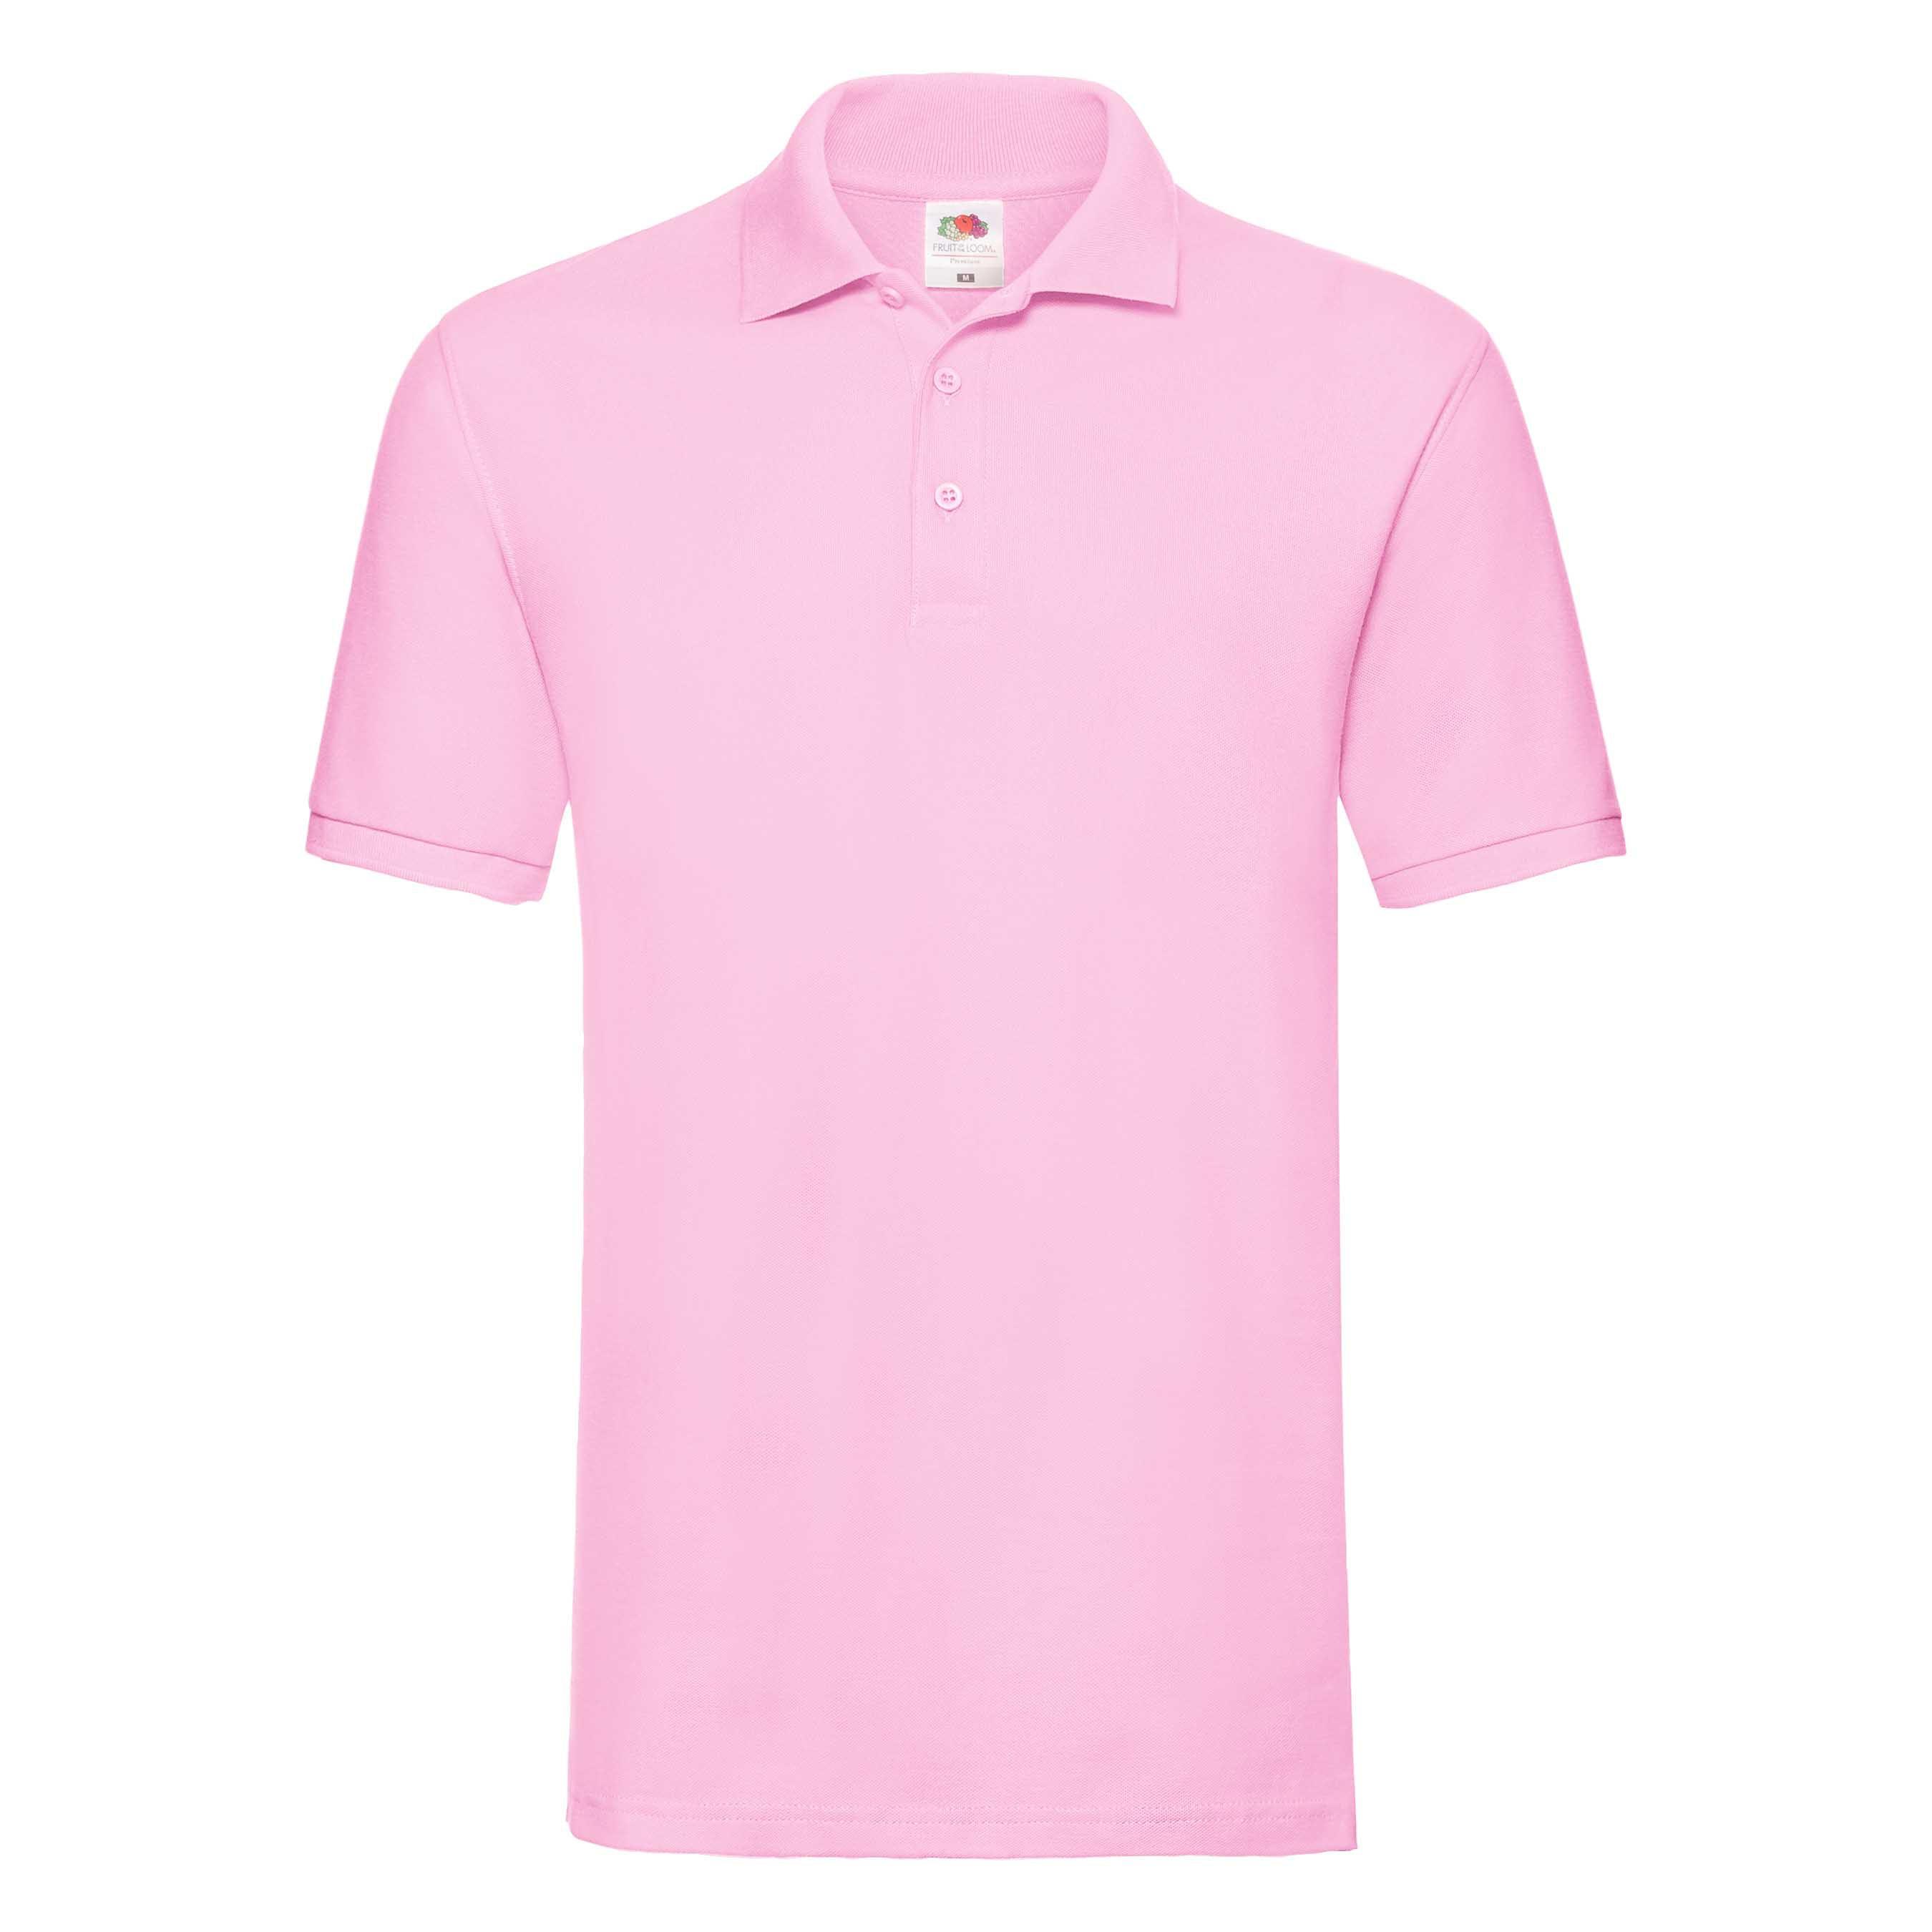 4bb40448c3e4 Dámske tričko dlhý rkáv LADY-FIT L S VALUEWEIGHT T - Fruitshop